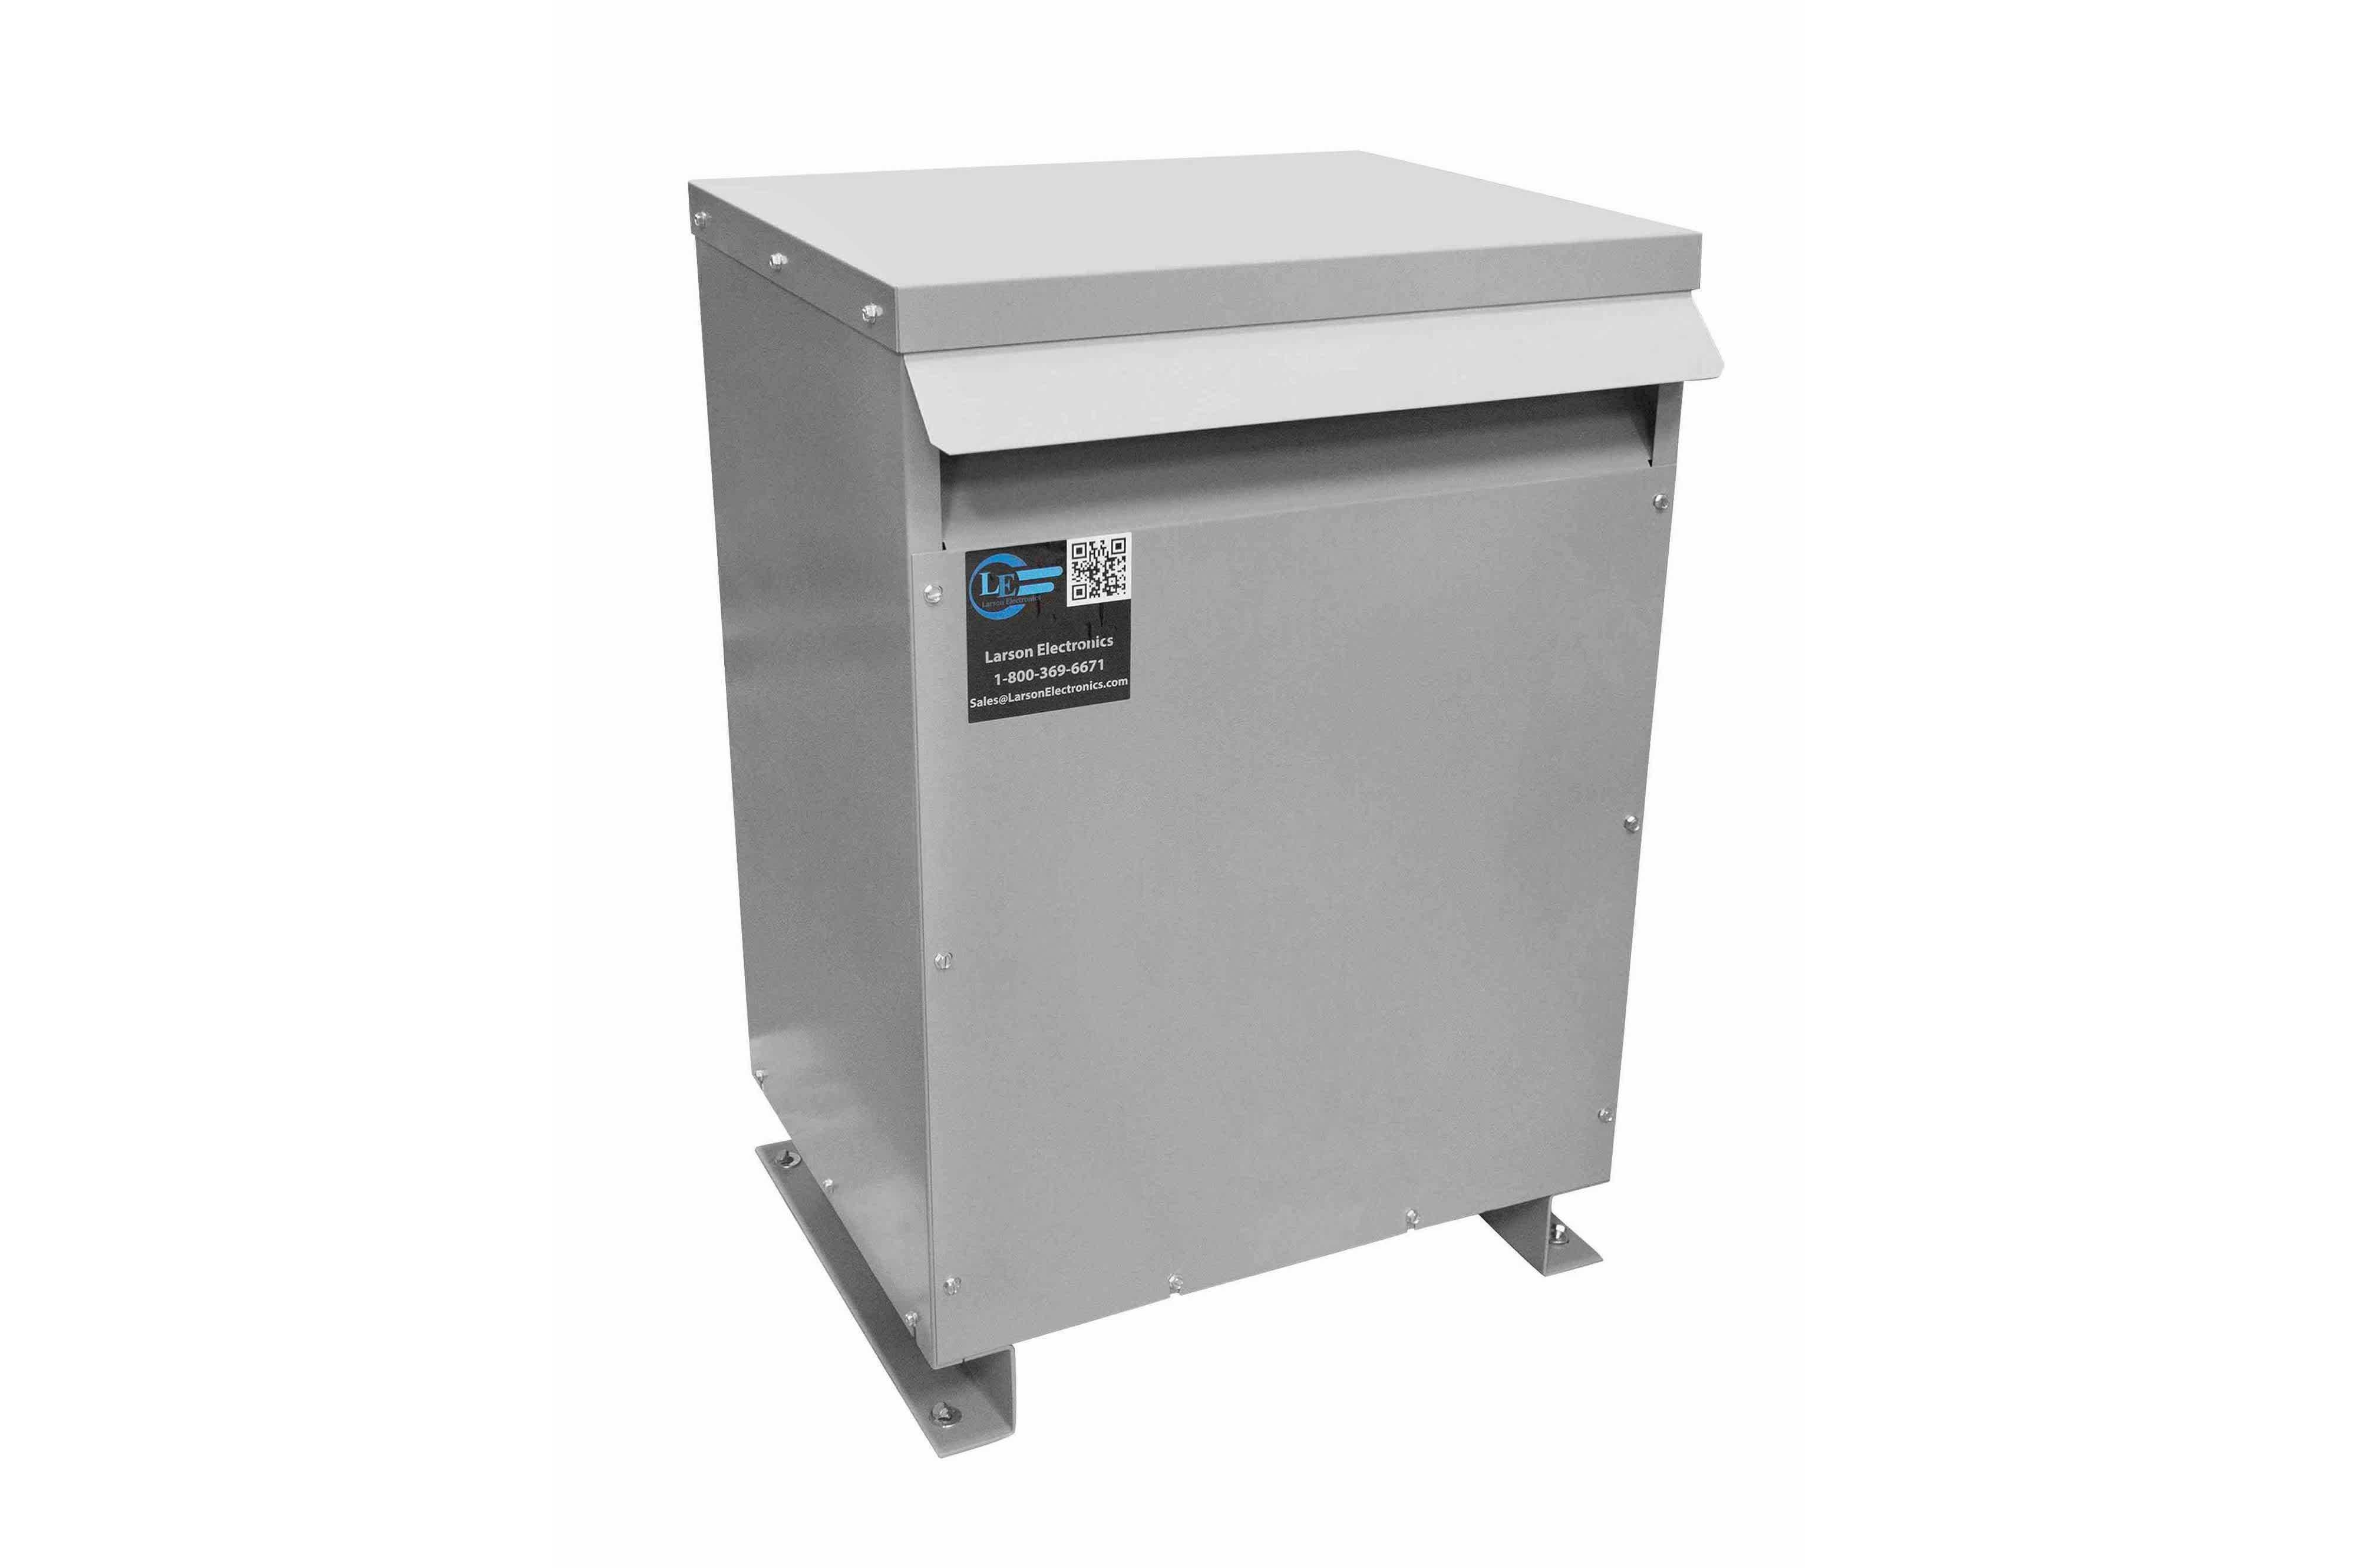 300 kVA 3PH Isolation Transformer, 400V Wye Primary, 480Y/277 Wye-N Secondary, N3R, Ventilated, 60 Hz